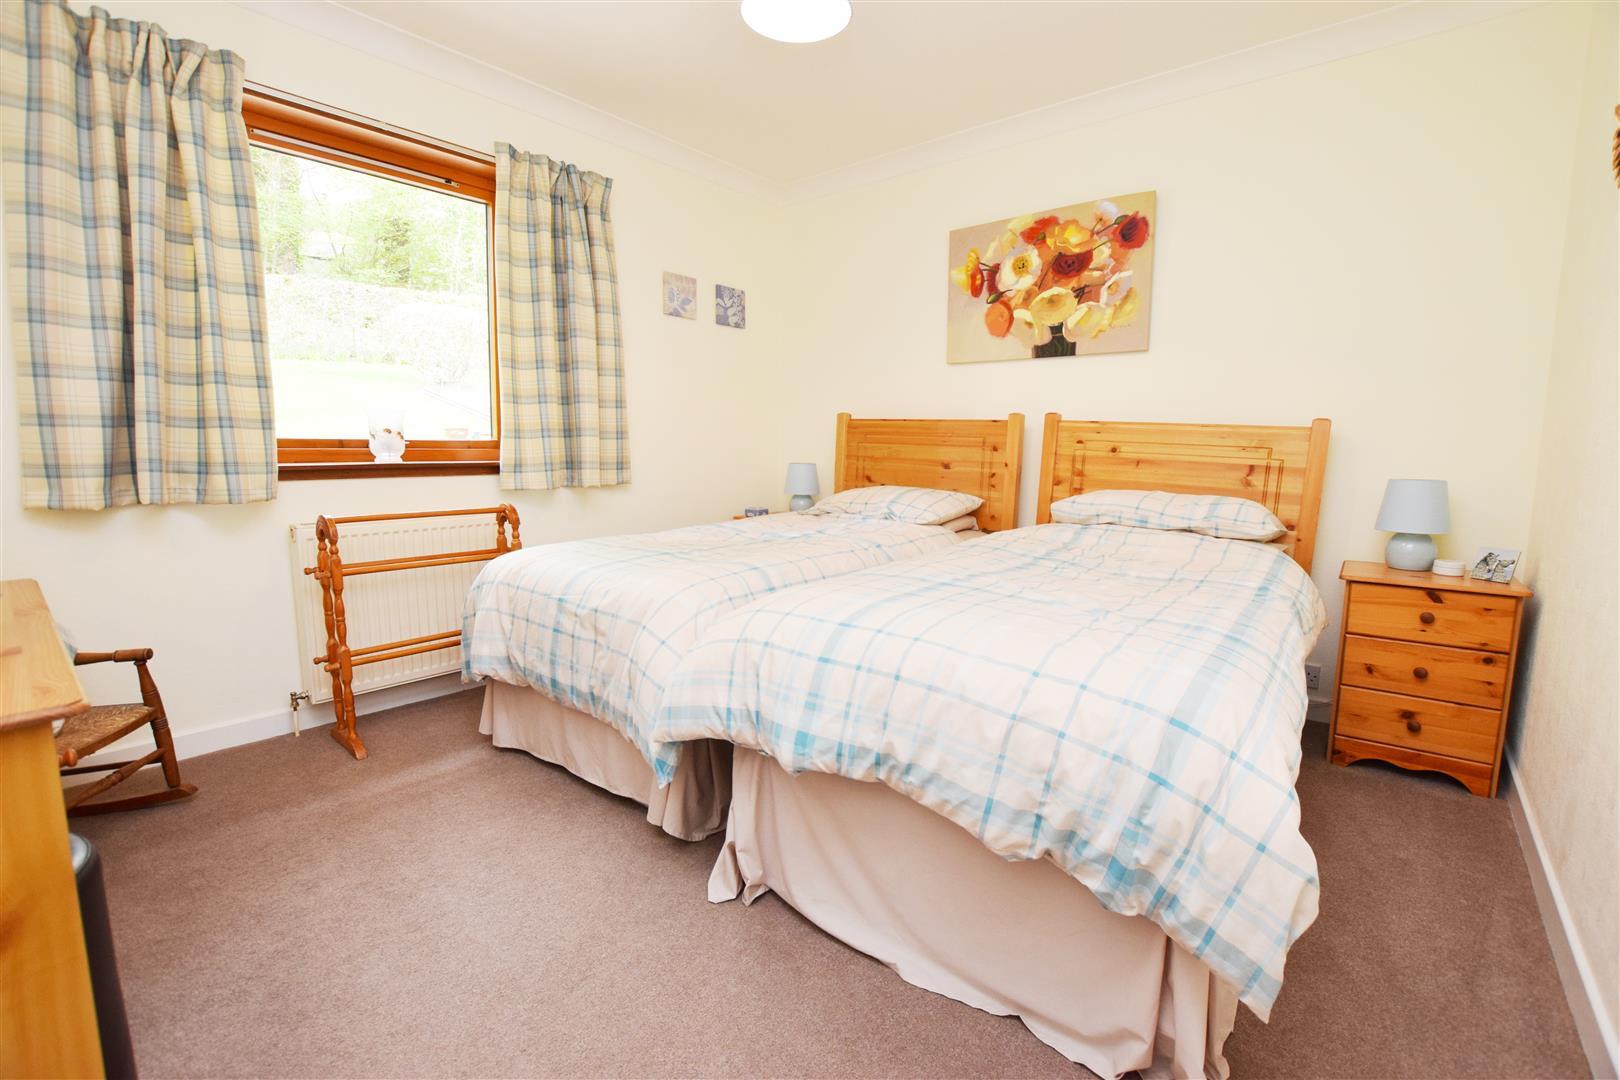 16, Sandeman Place, Luncarty, Perthshire, PH1 3RJ, UK